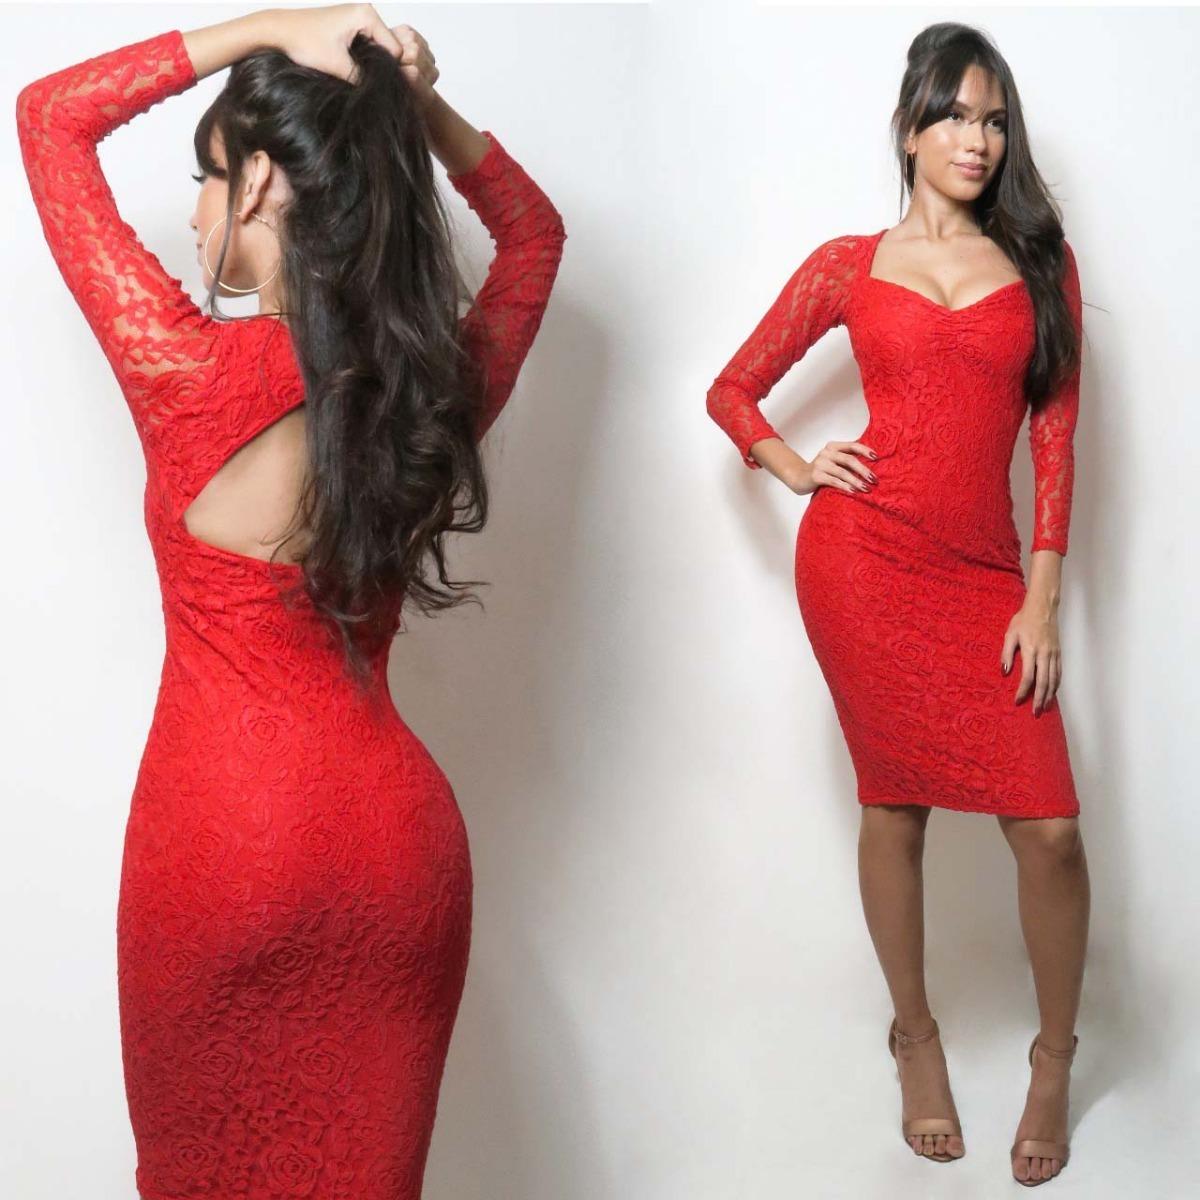 f9f8b2cdc vestido midi renda manga longa decote vermelho festa vrm56. Carregando zoom.